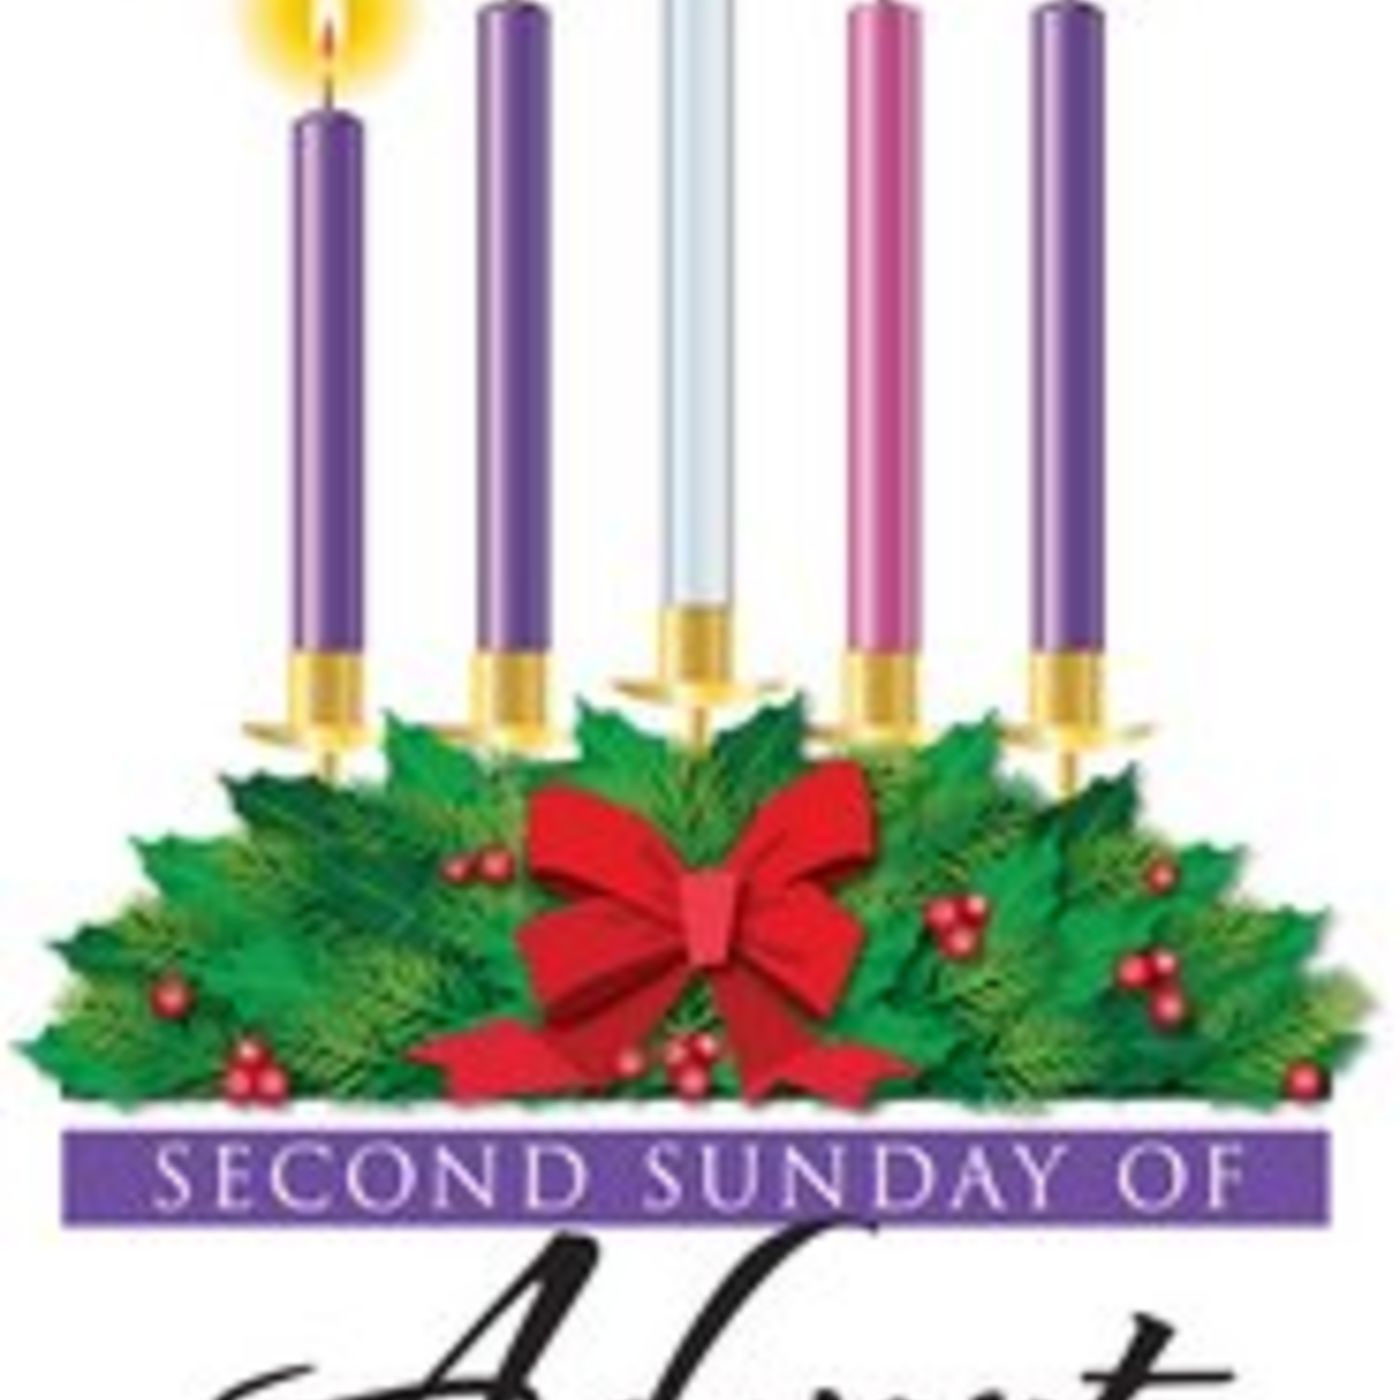 Second Sunday of Advent - Preparation